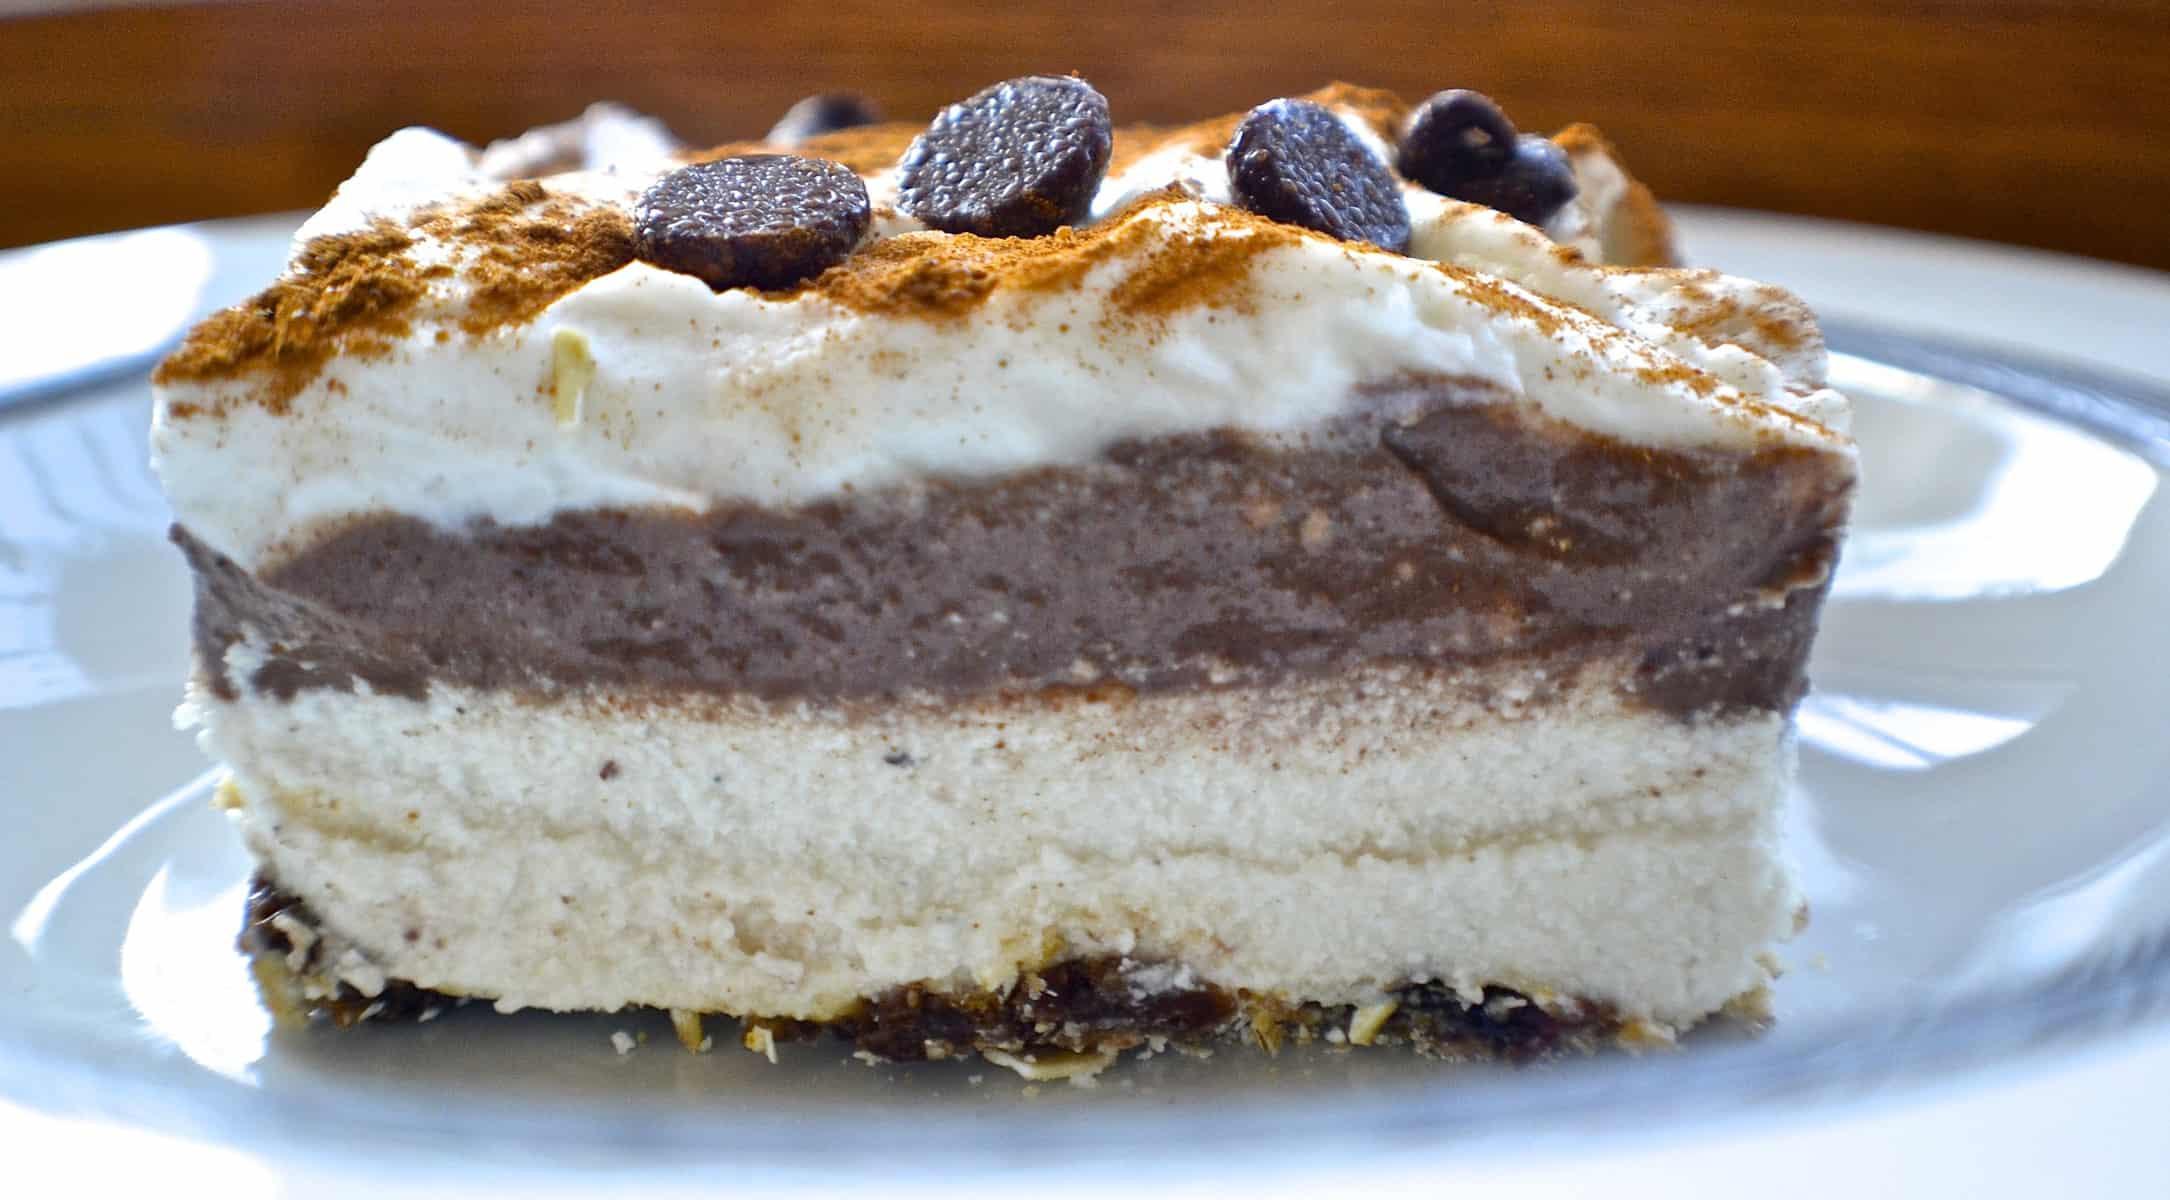 Vegan Desserts To Buy  The best vegan chocolate dessert recipe ever